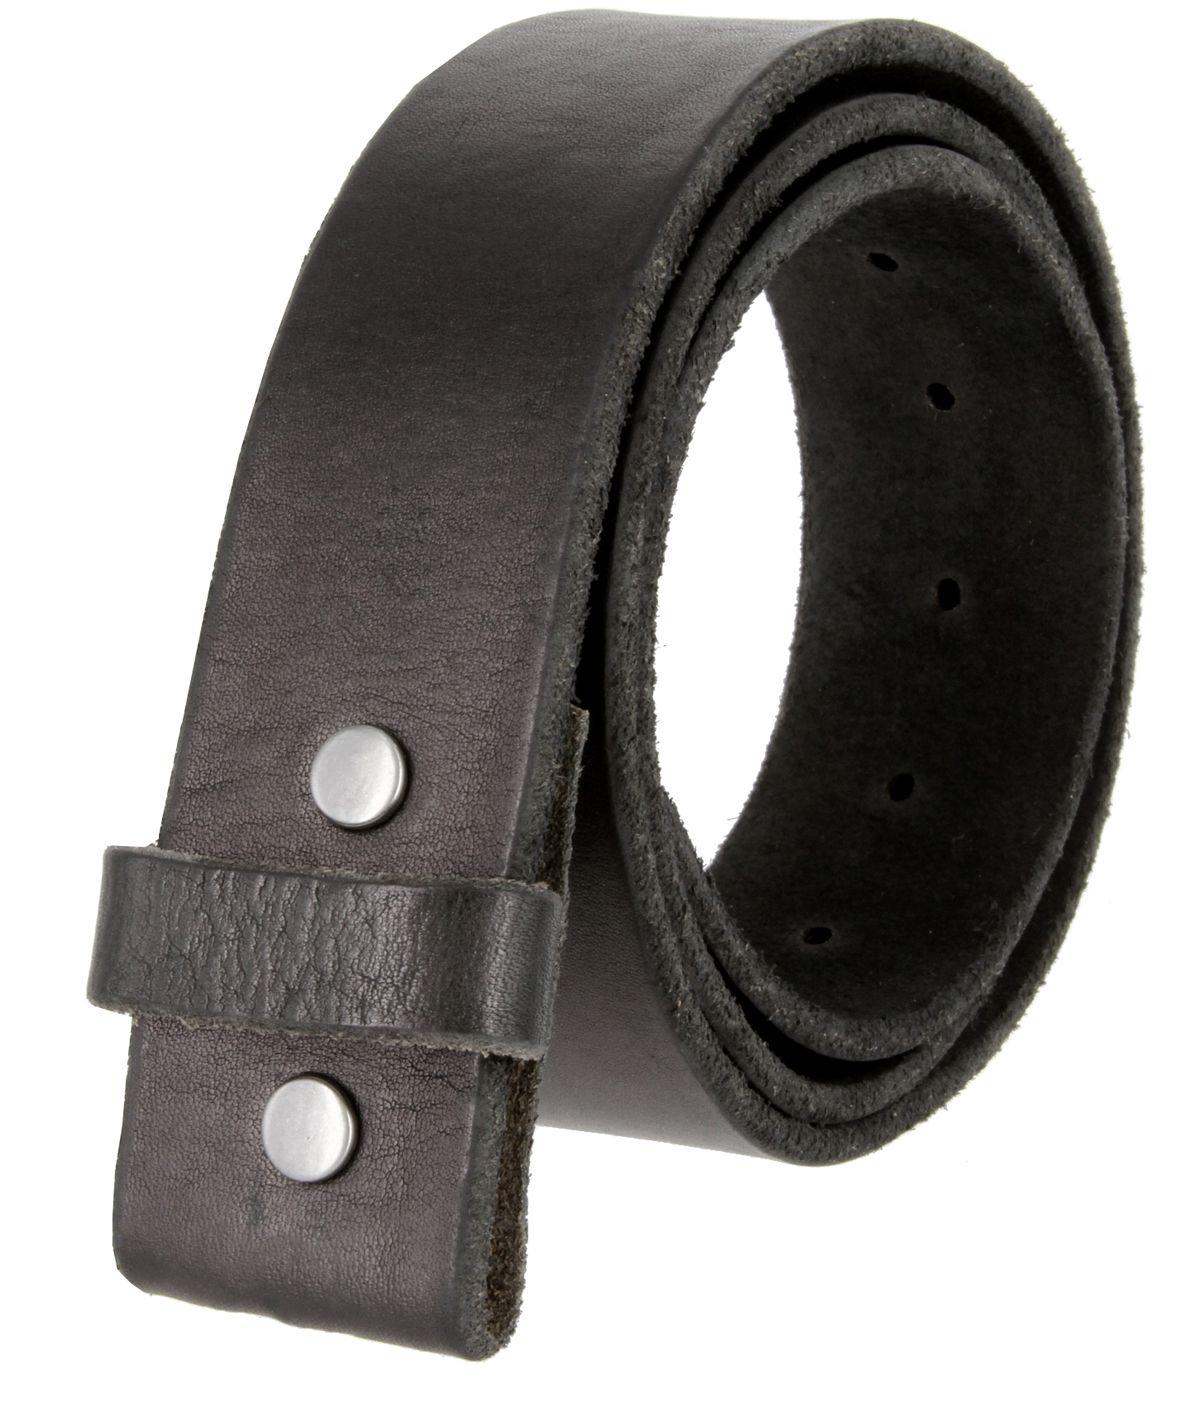 Solid One Piece Genuine Leather Belt Strap Without Slot Hole 1 1 2 Wide Genuine Leather Belt Custom Leather Belts Unisex Accessories